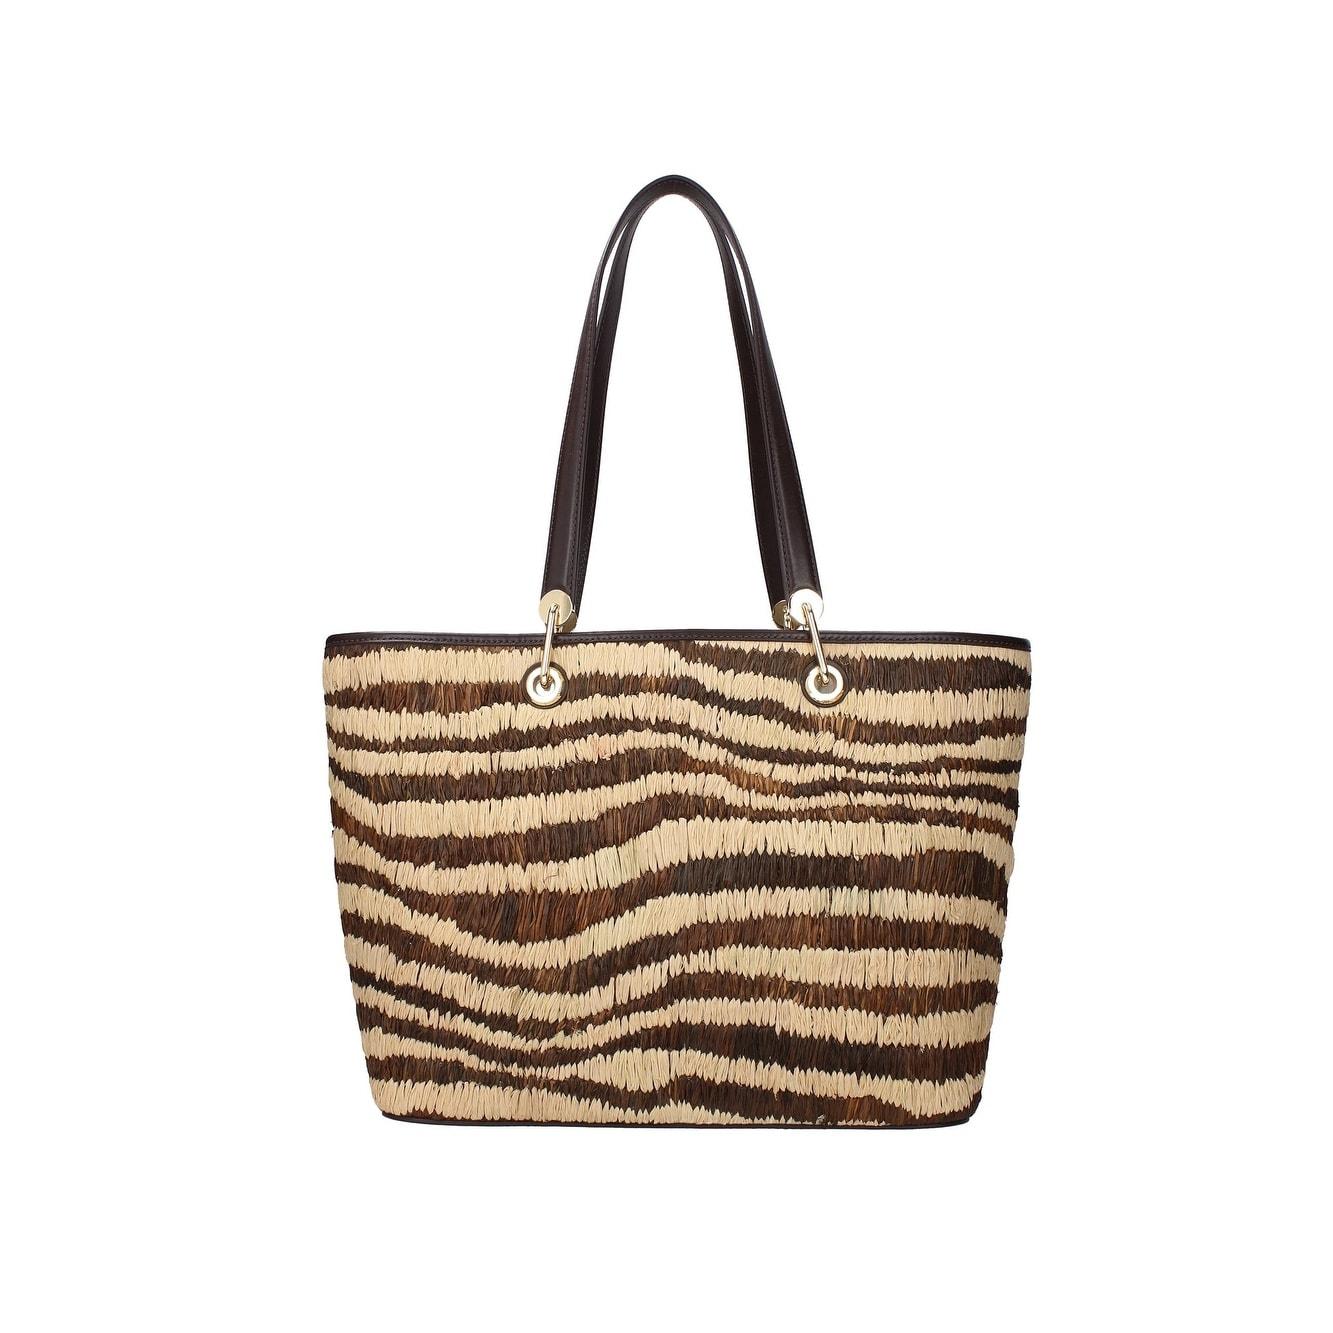 Michael Kors New Malibu Straw Large Natural Brown Tote Handbag Purse